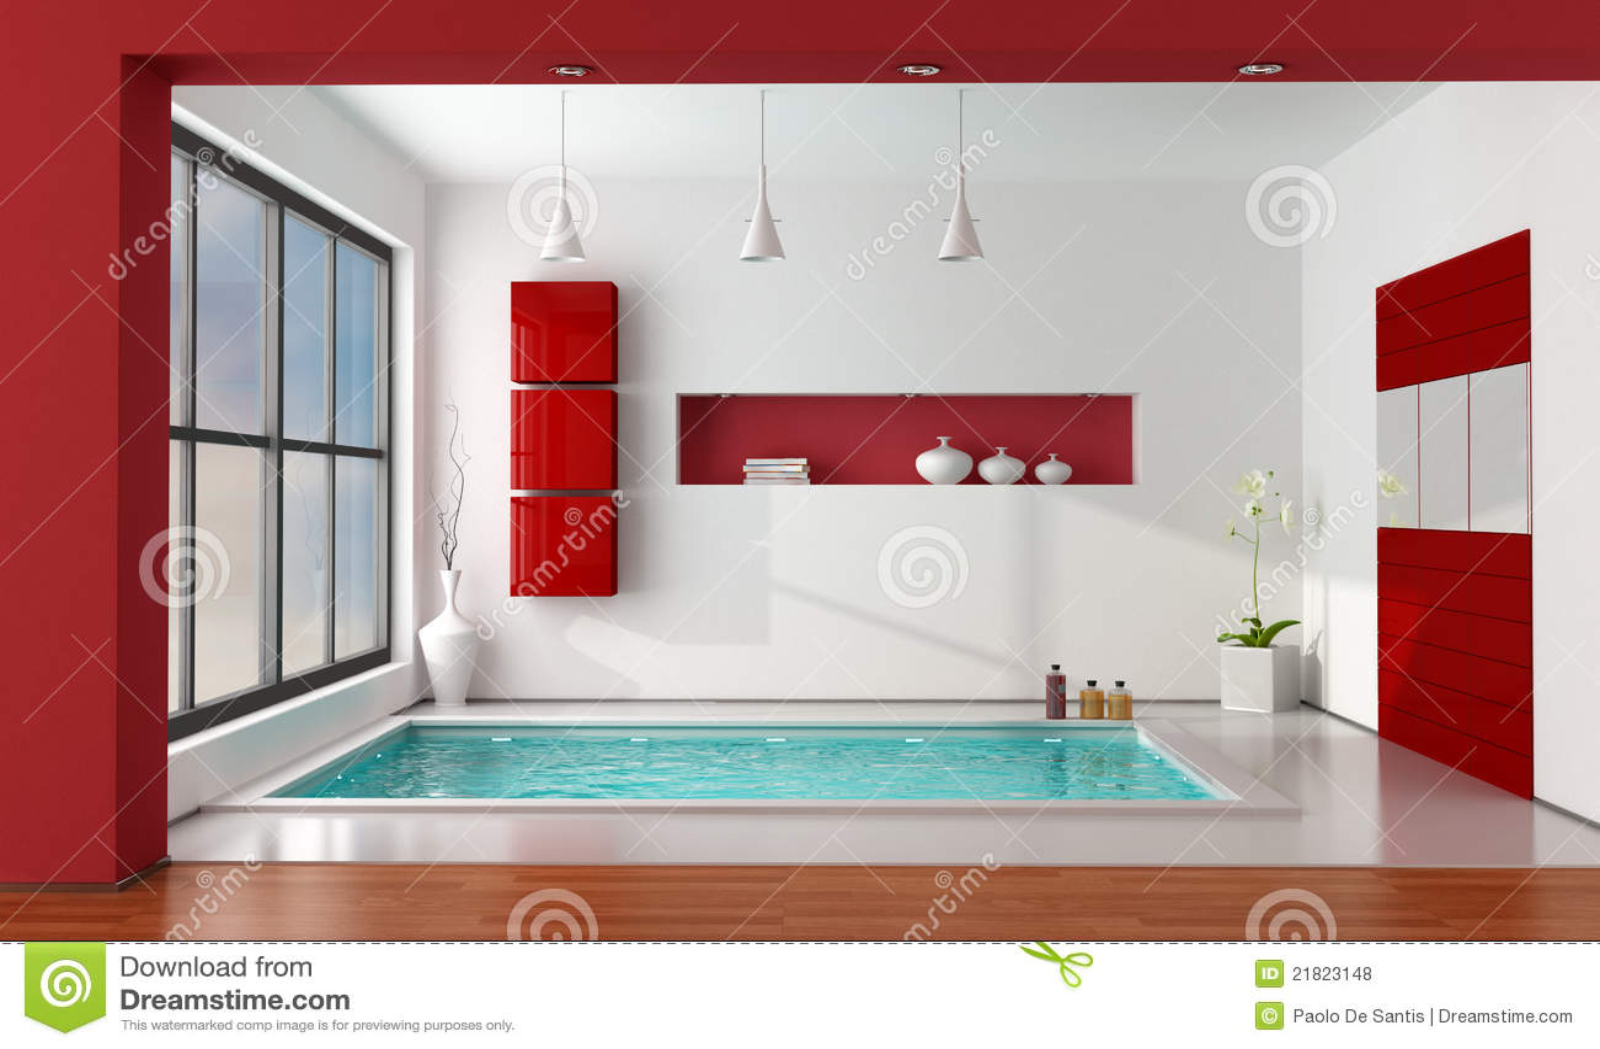 Vasca Da Bagno Rossa : Rubinetteria vasca da bagno rosso ral miscelatore vasca